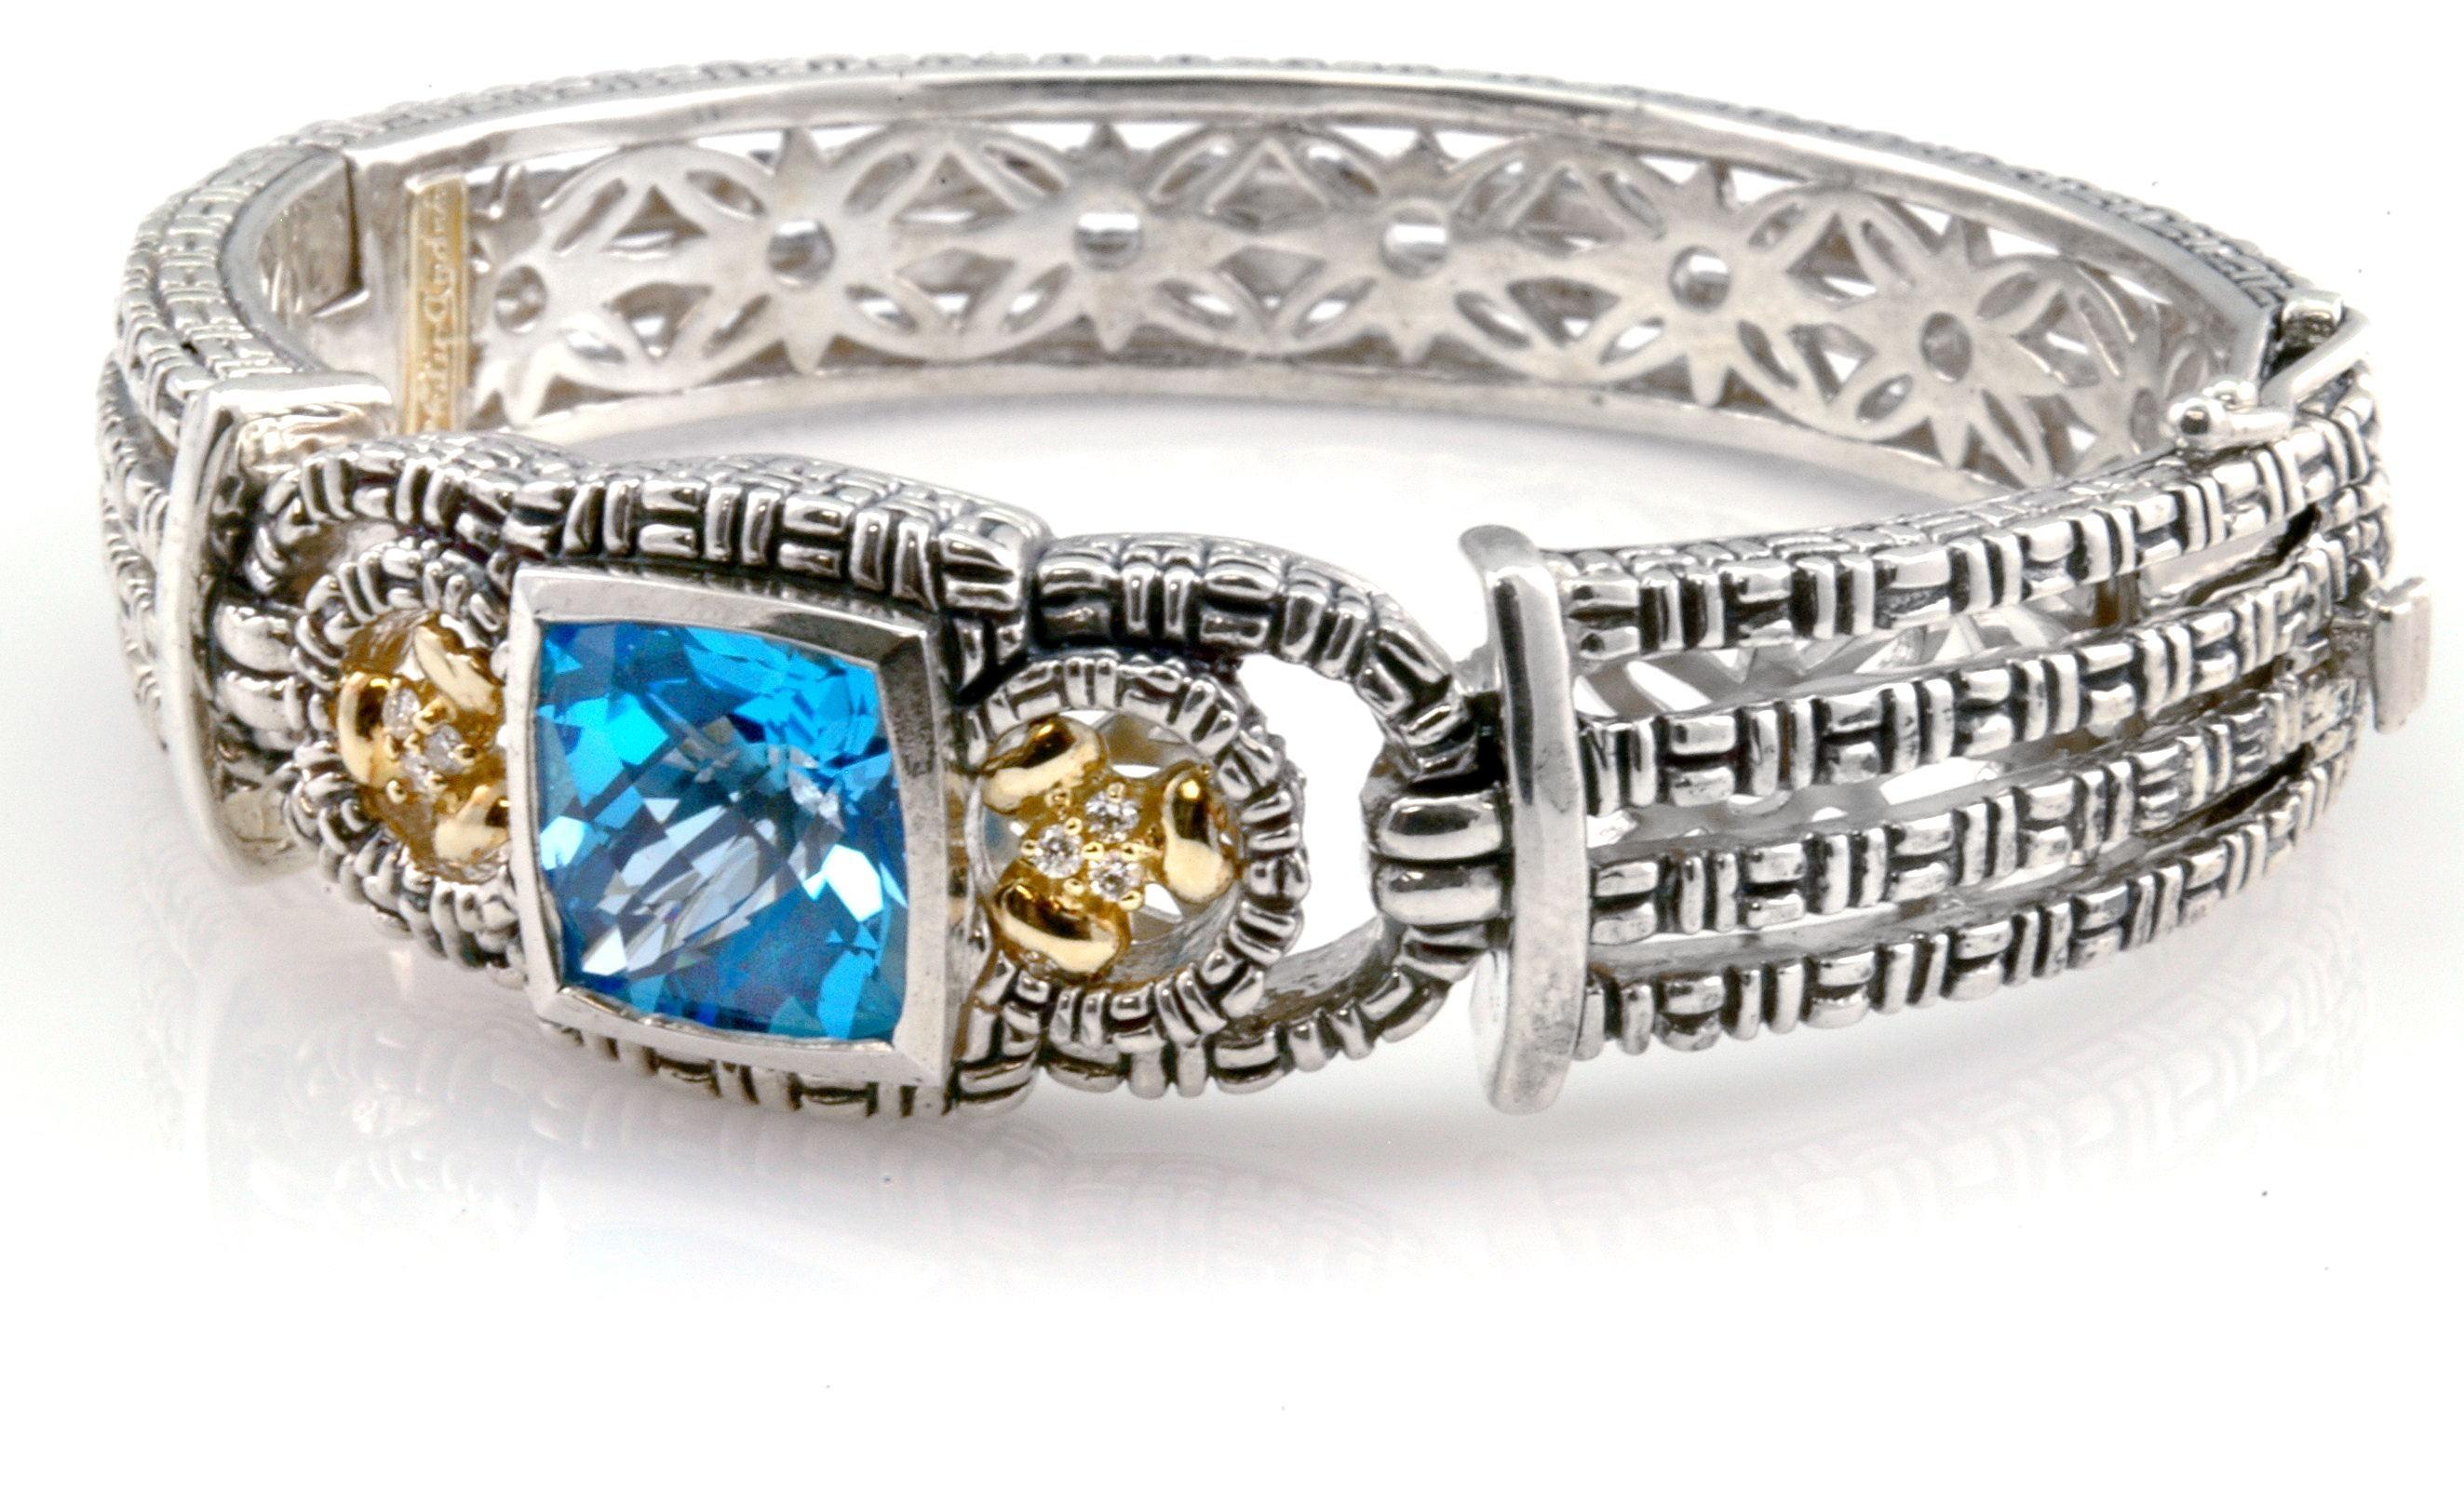 Philip Andre Jewelry, Inc.